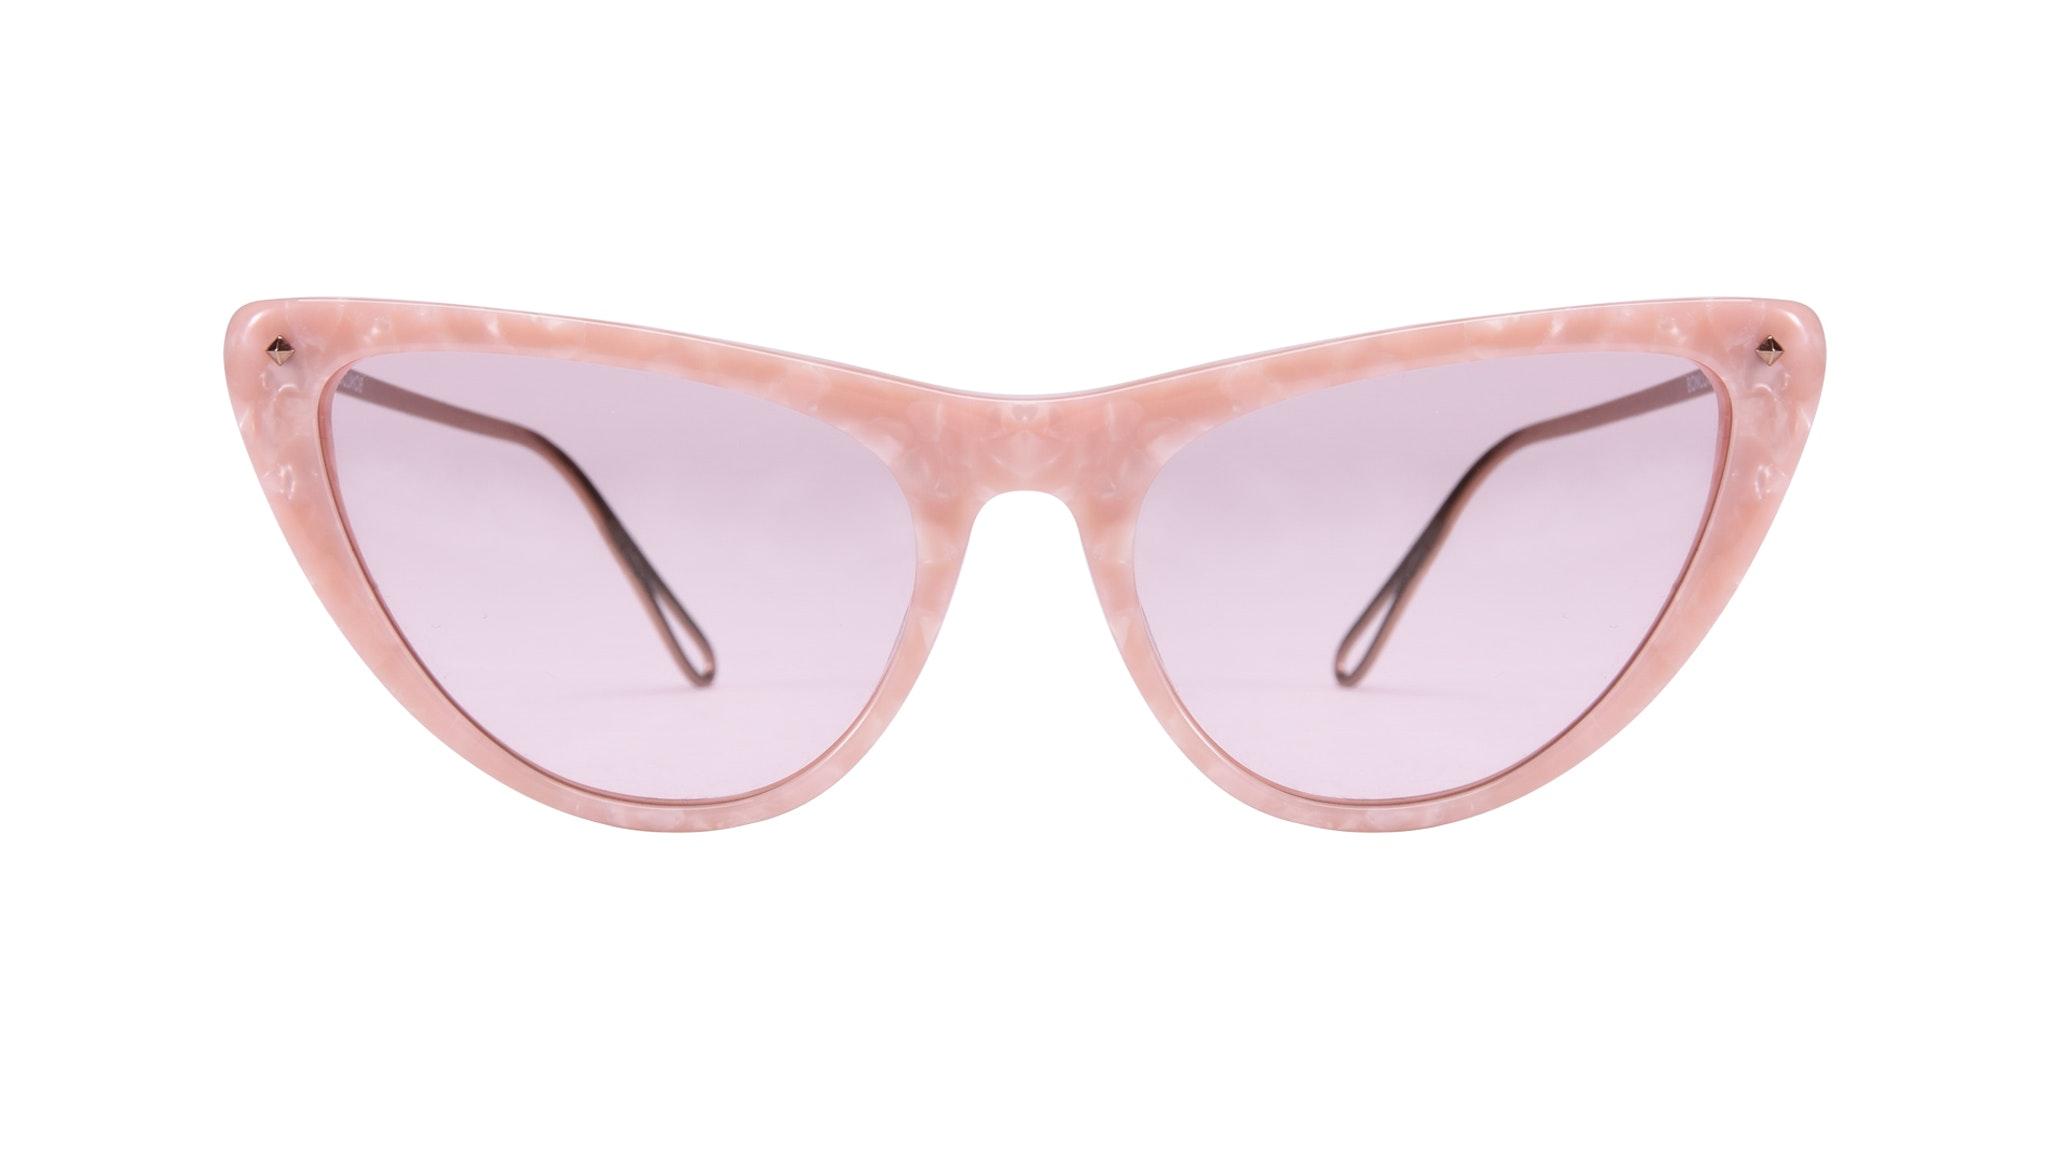 Affordable Fashion Glasses Cat Eye Sunglasses Women Celeste Rose Front